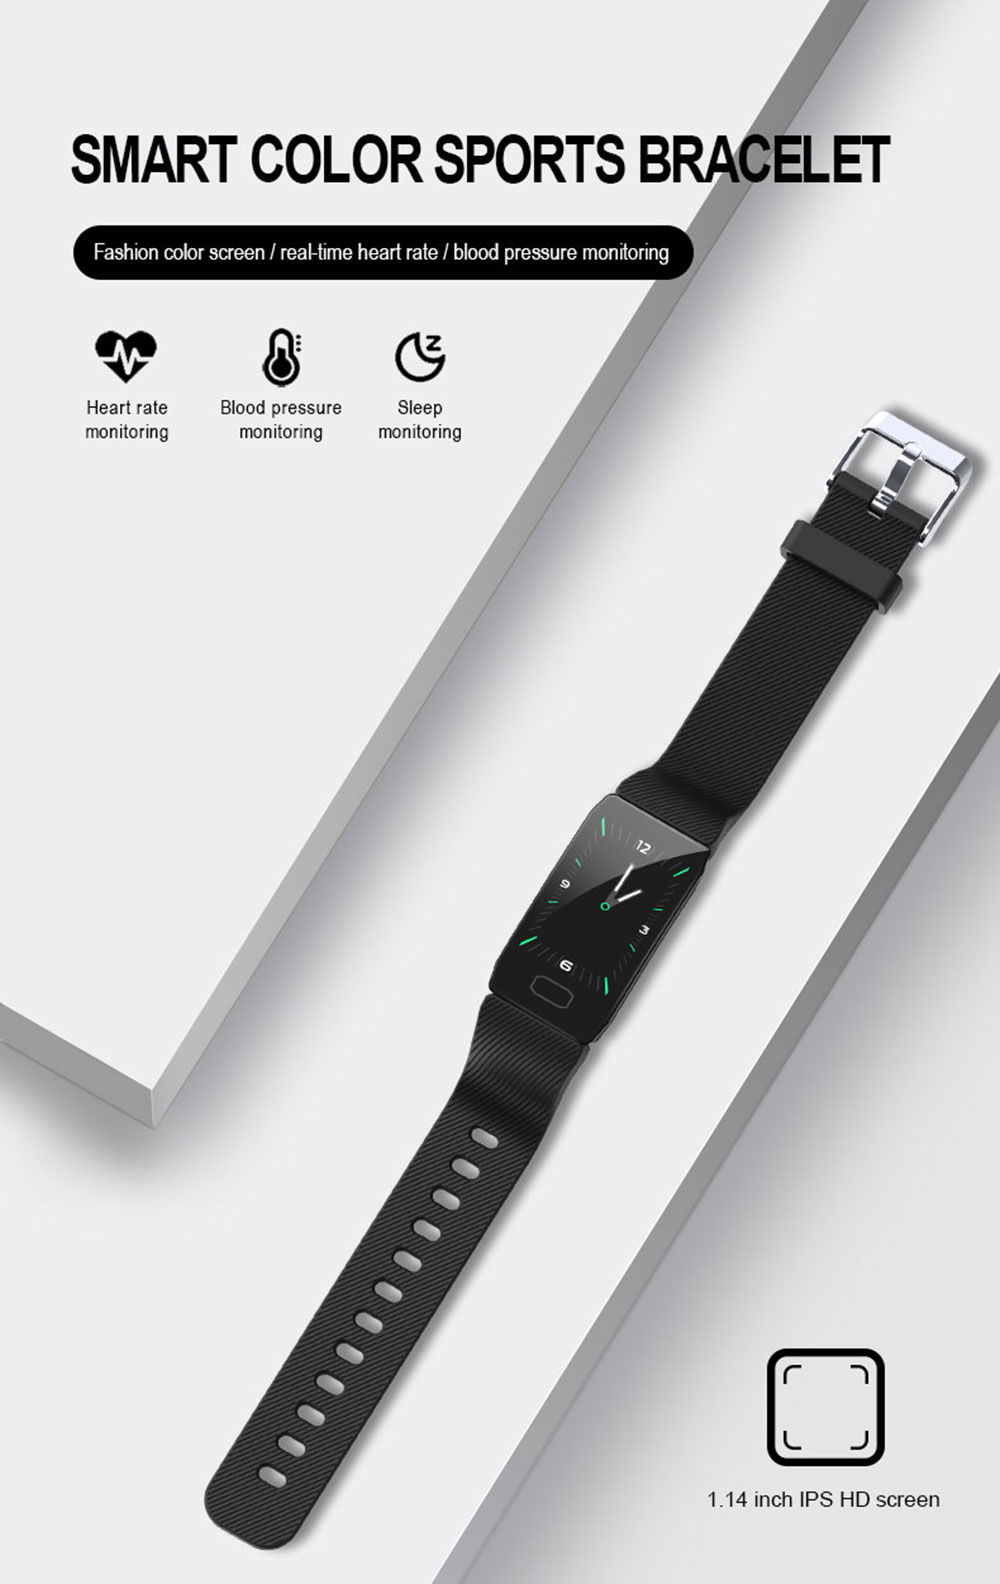 HTB1rjW XHH1gK0jSZFwq6A7aXXa4 Smart Band Blood Pressure Q1 Heart Rate Monitor Fitness Tracker Smart Watch Fitness Bracelet Waterproof Weather Display Women